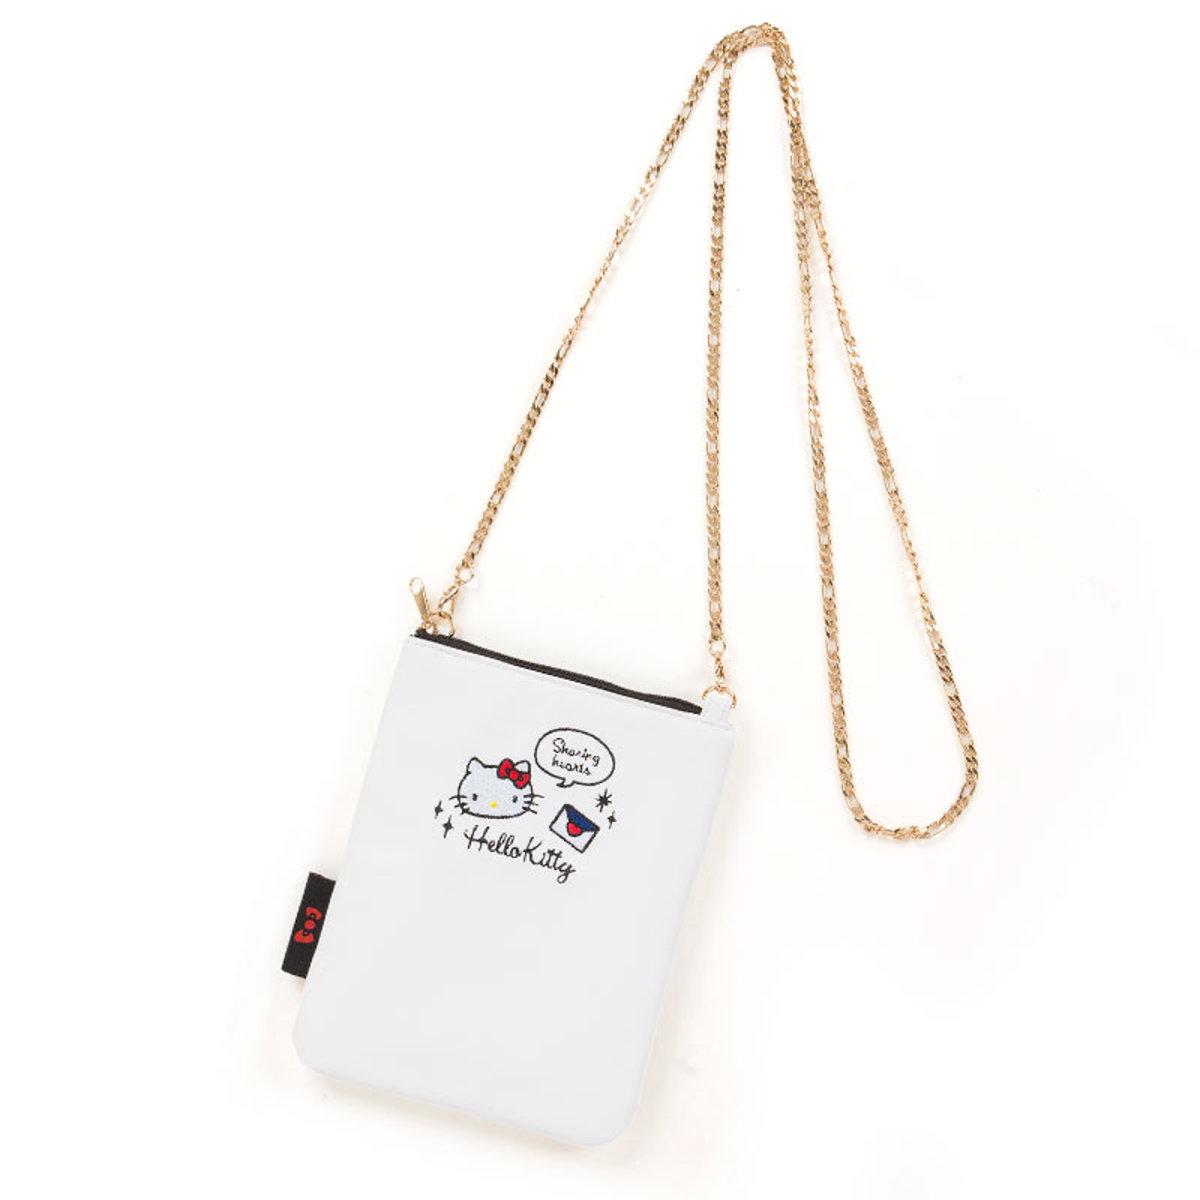 SANRIO   Shoulder bag with chain strap - Hello Kitty   HKTVmall ... 55209e7031